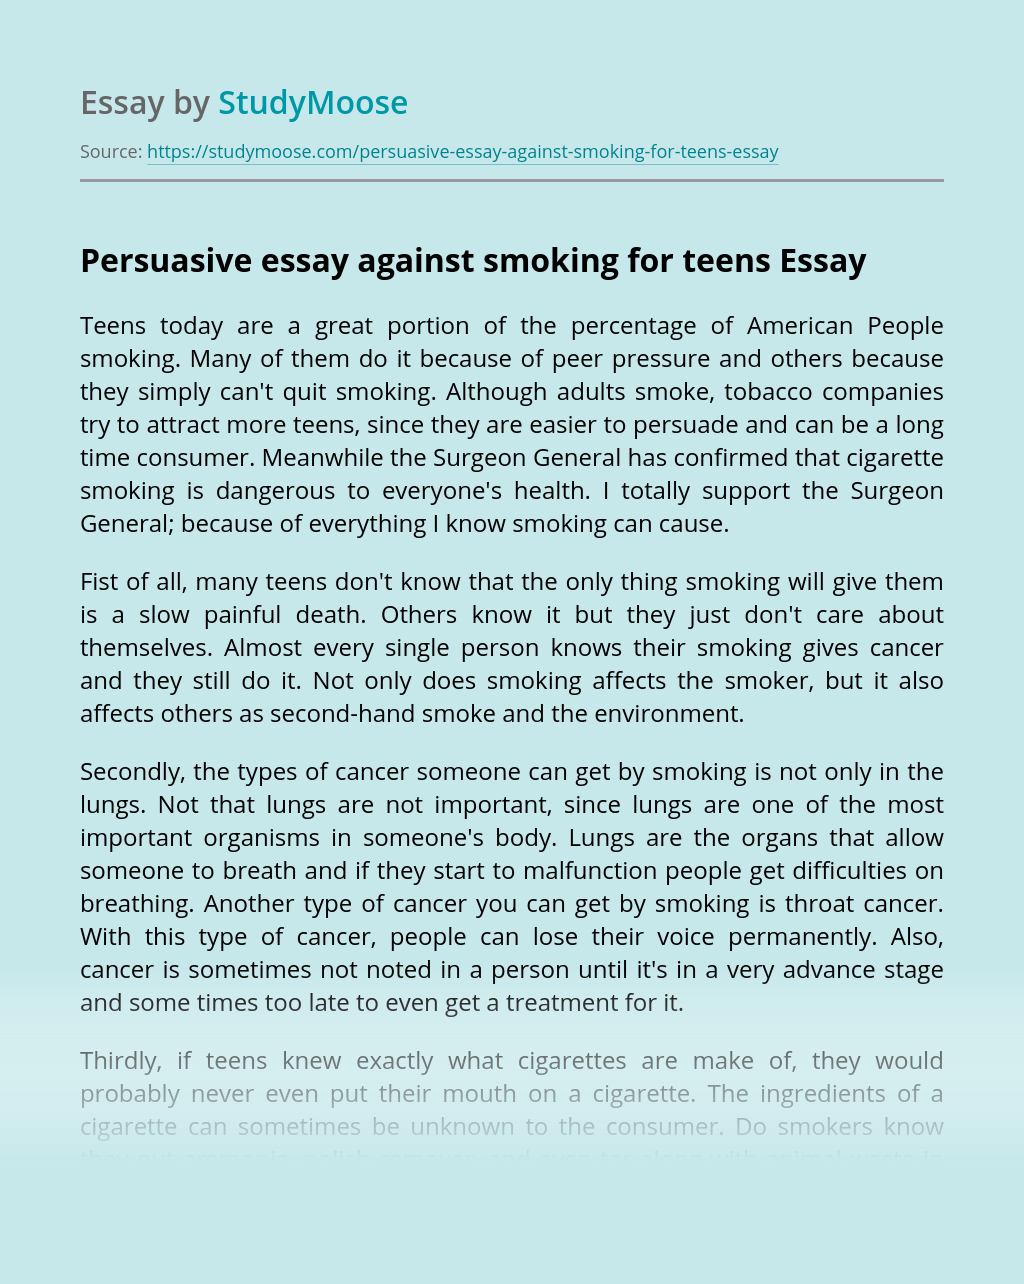 Persuasive essay against smoking for teens